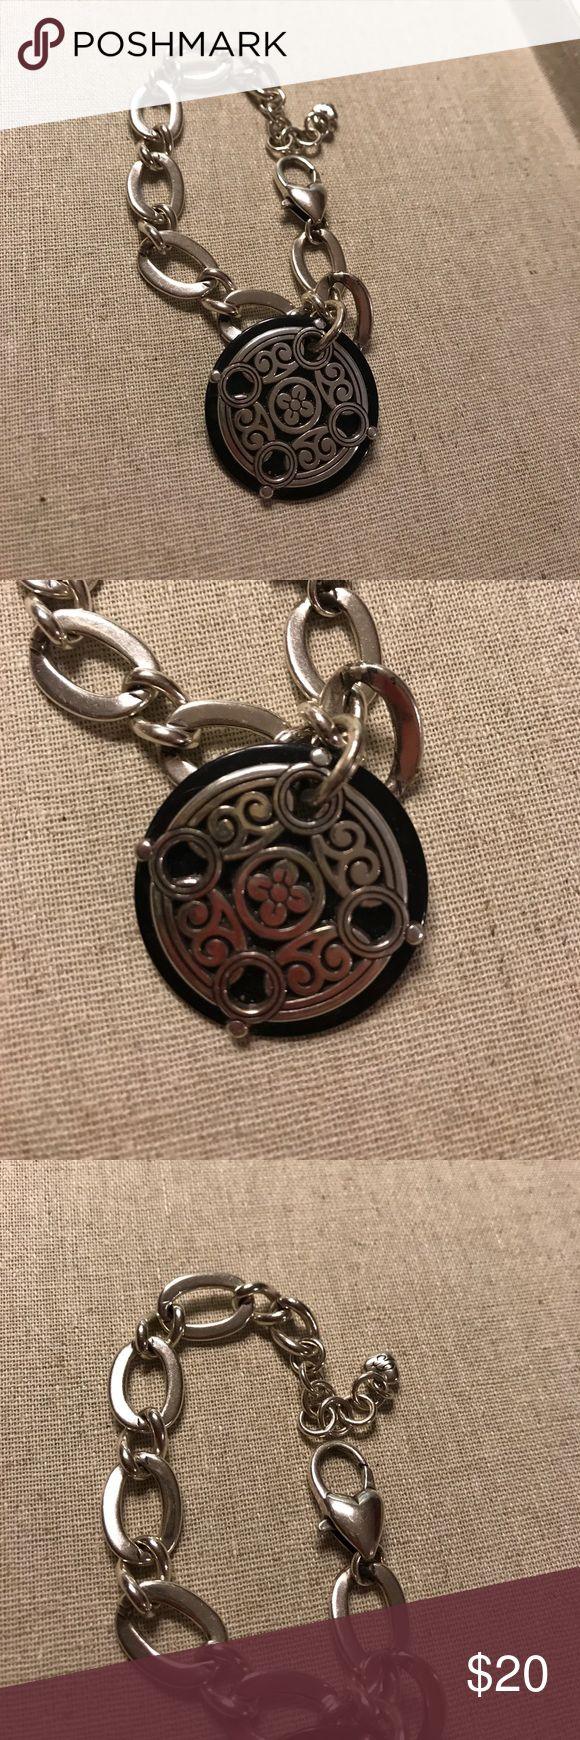 Brighton bracelet with silver and black charm Lovely Brighton bracelet with  silver and black charm Brighton Jewelry Bracelets